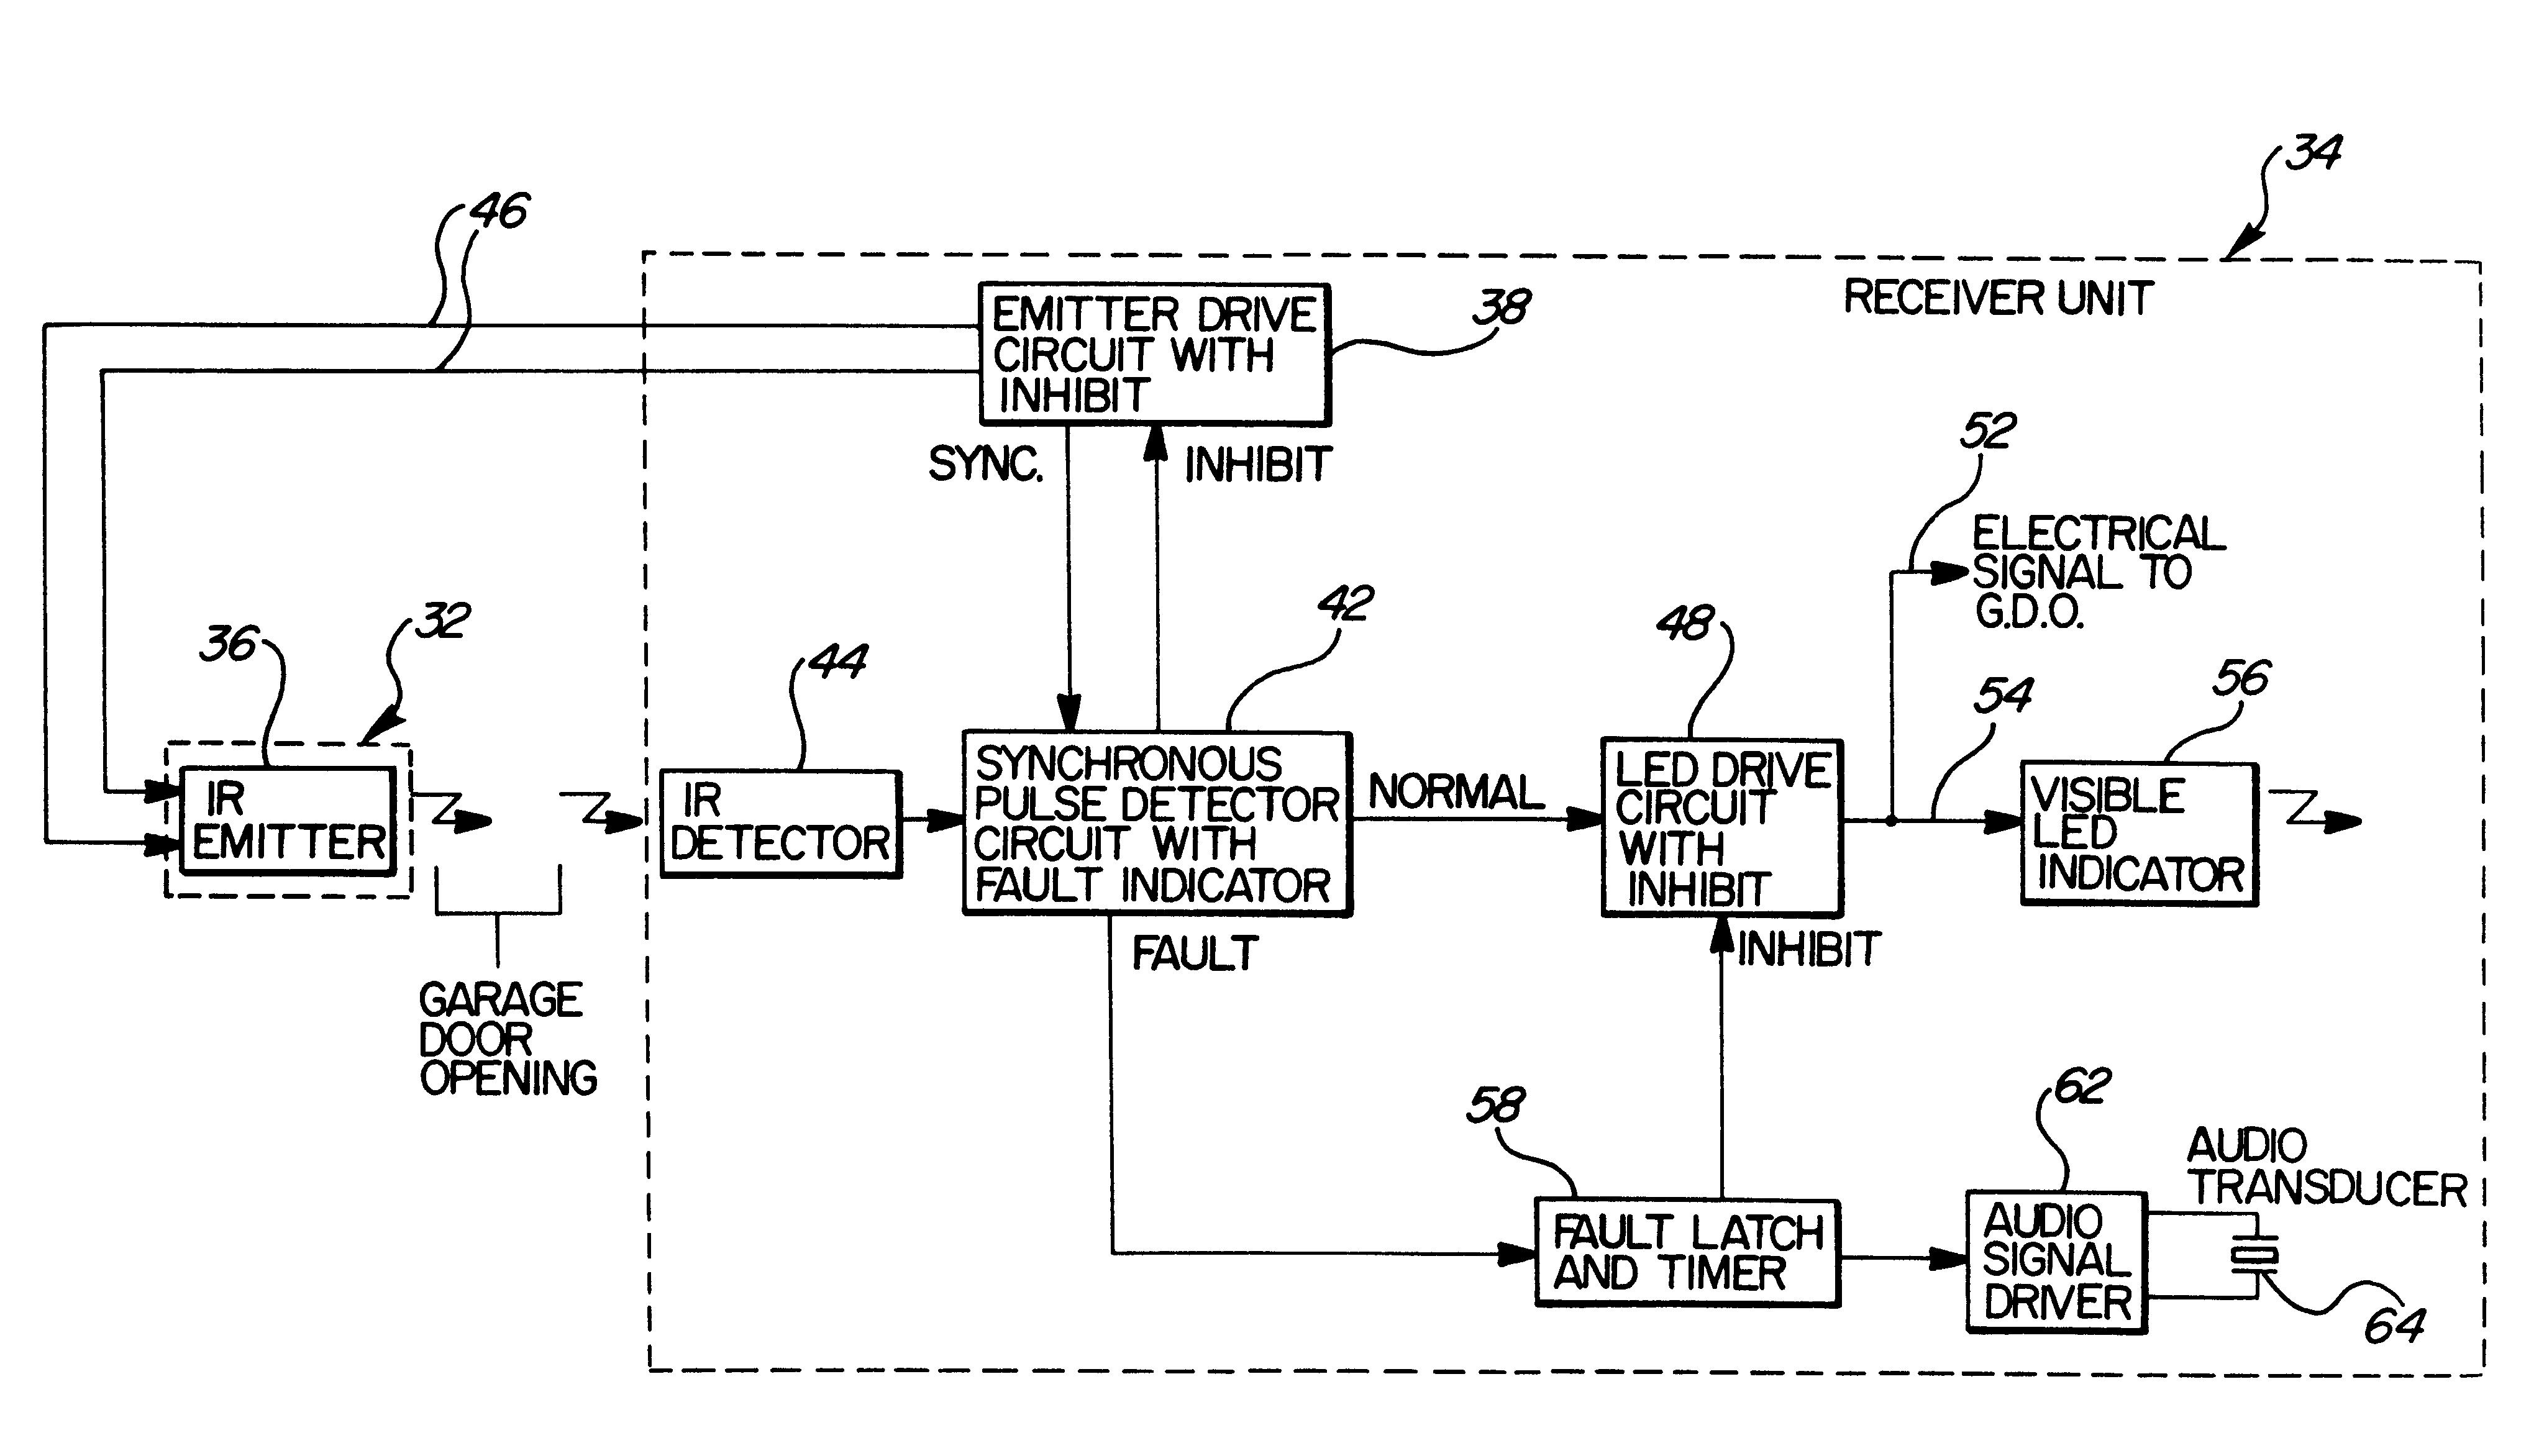 Chamberlain Garage Door Safety Sensor Wiring Diagram | Manual E-Books - Chamberlain Garage Door Sensor Wiring Diagram